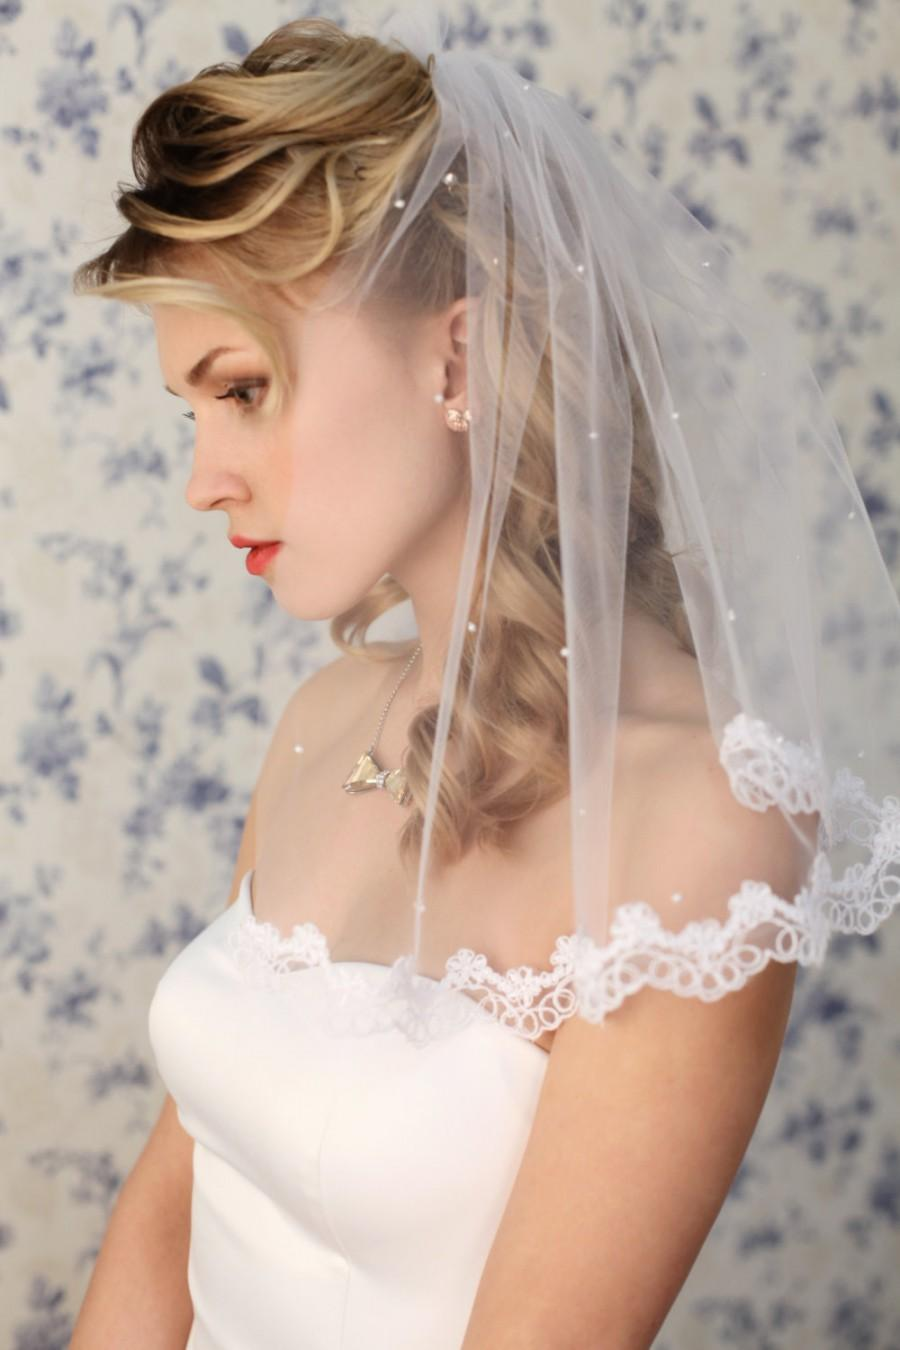 Hochzeit - One tier wedding veil A1, Bridal veil, Bridal Accessories, Wedding Accessories